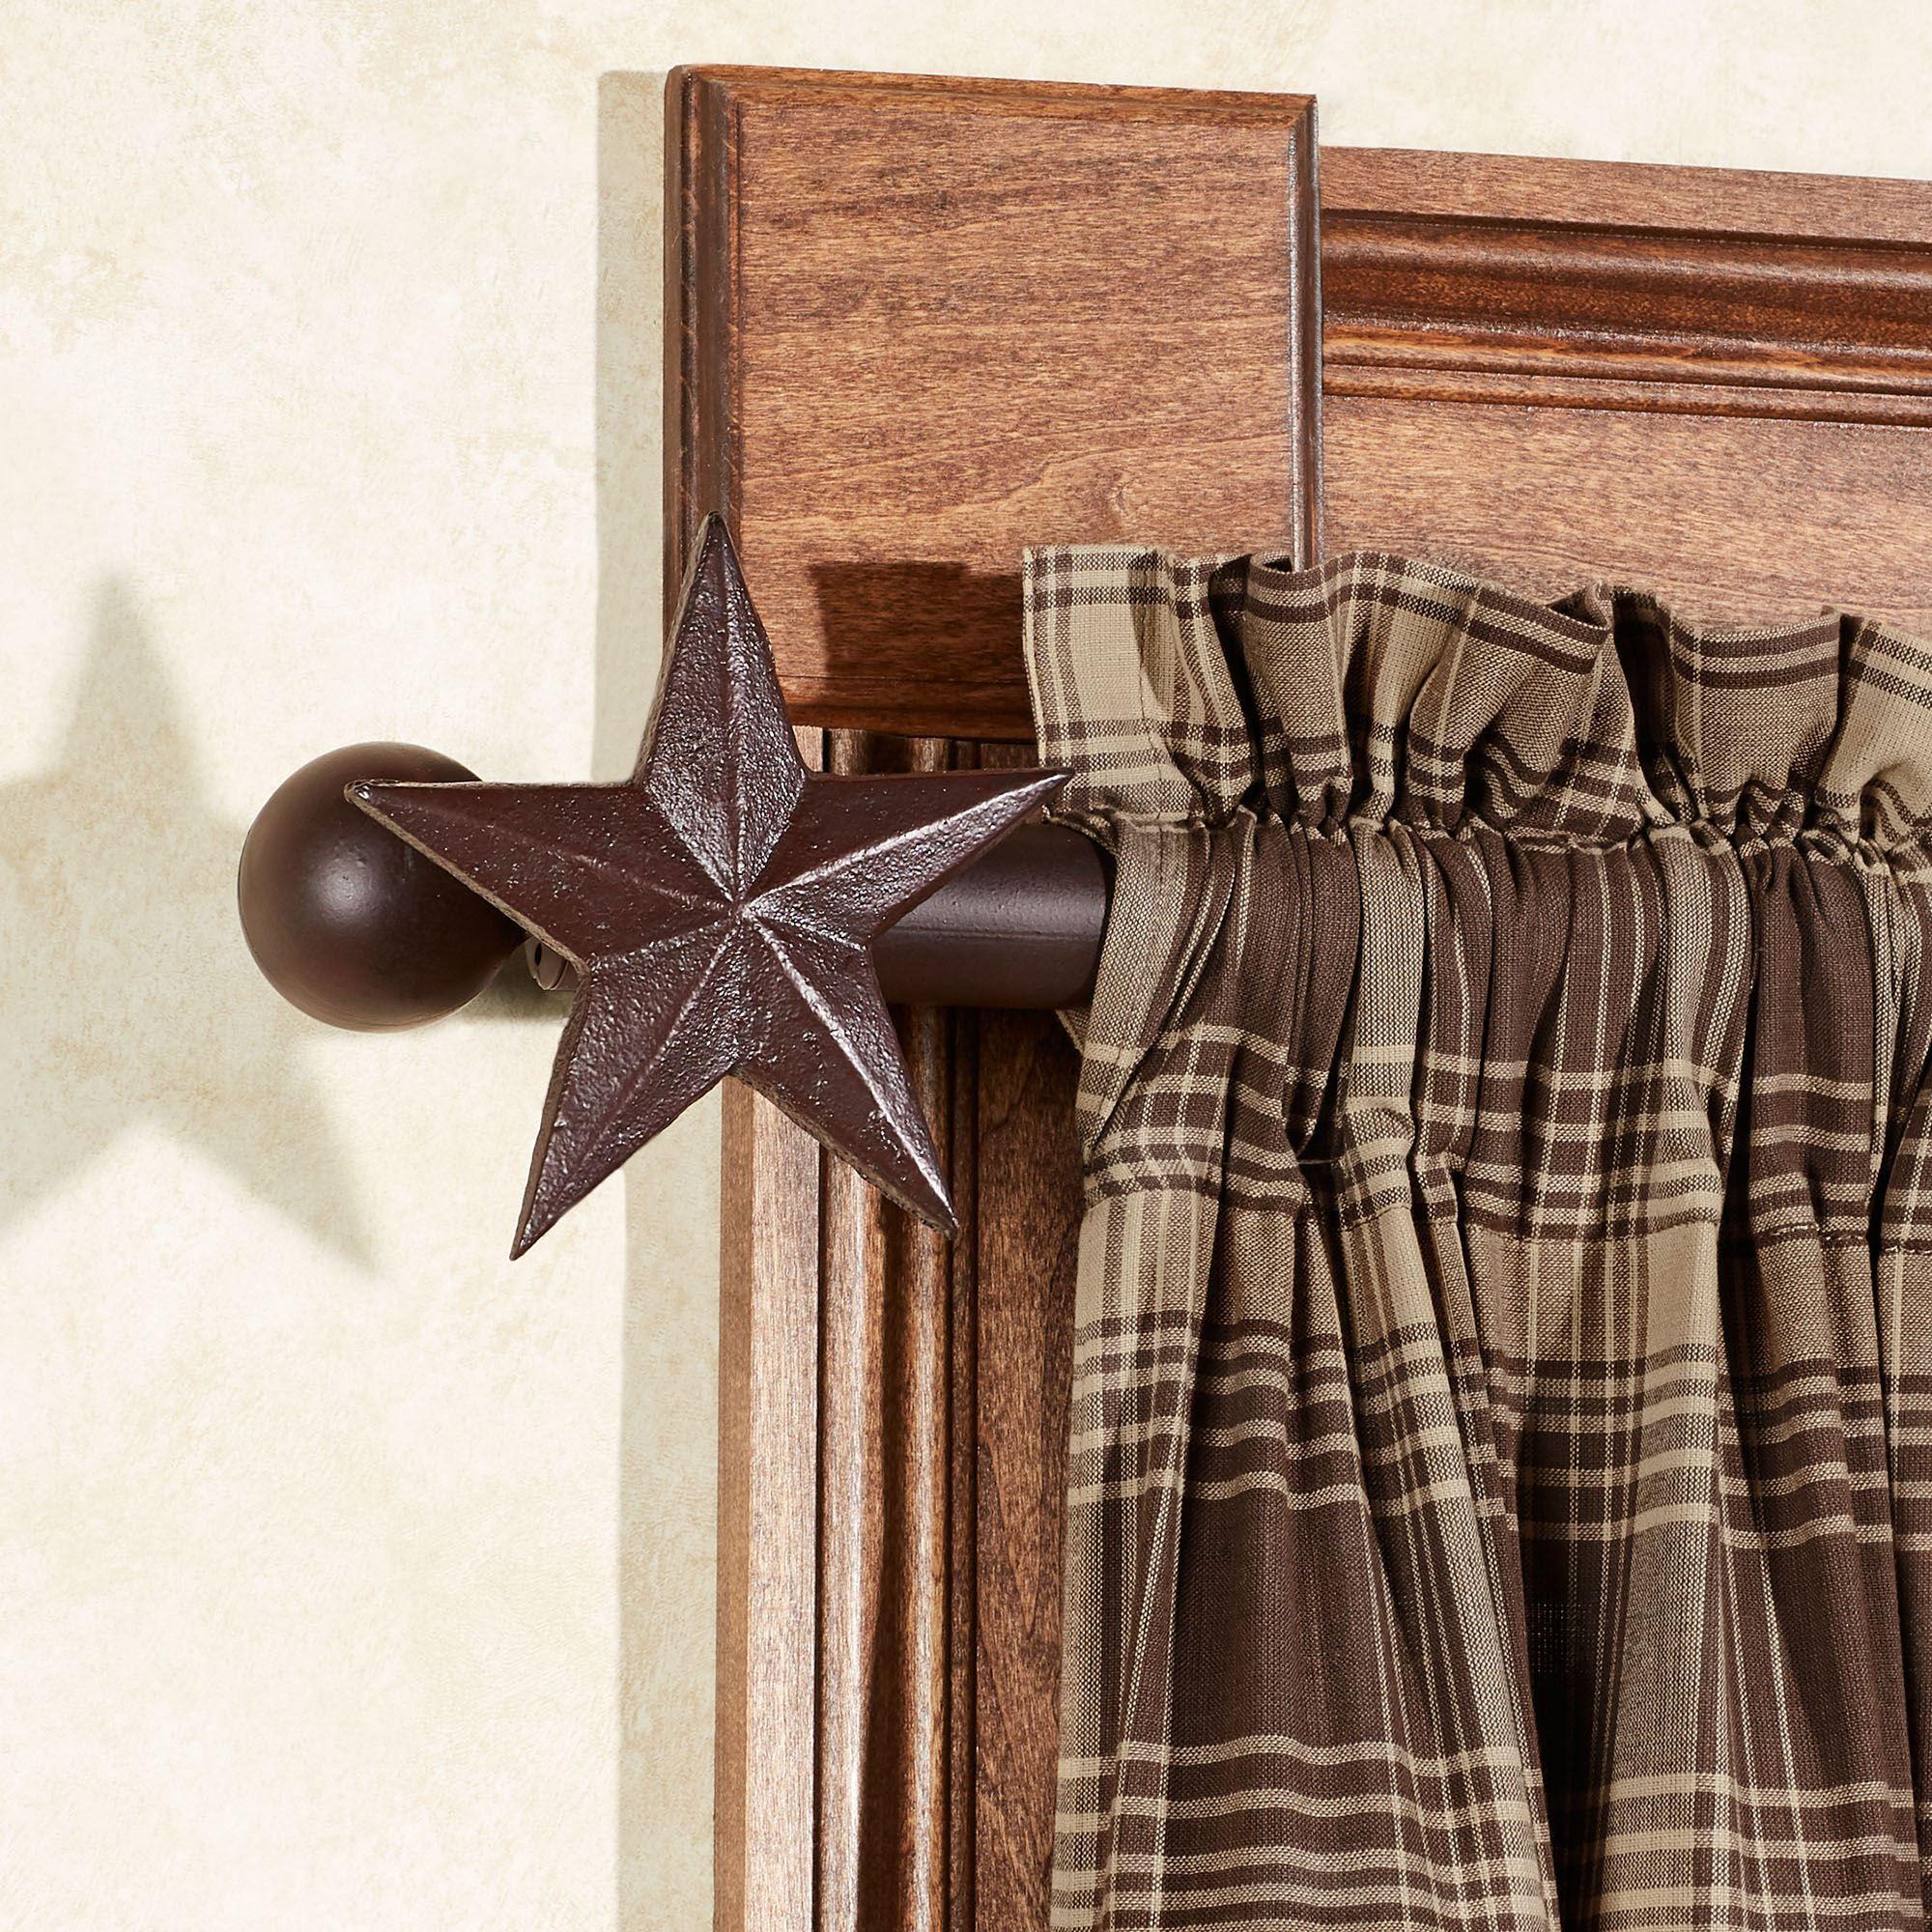 star decorative curtain rod set